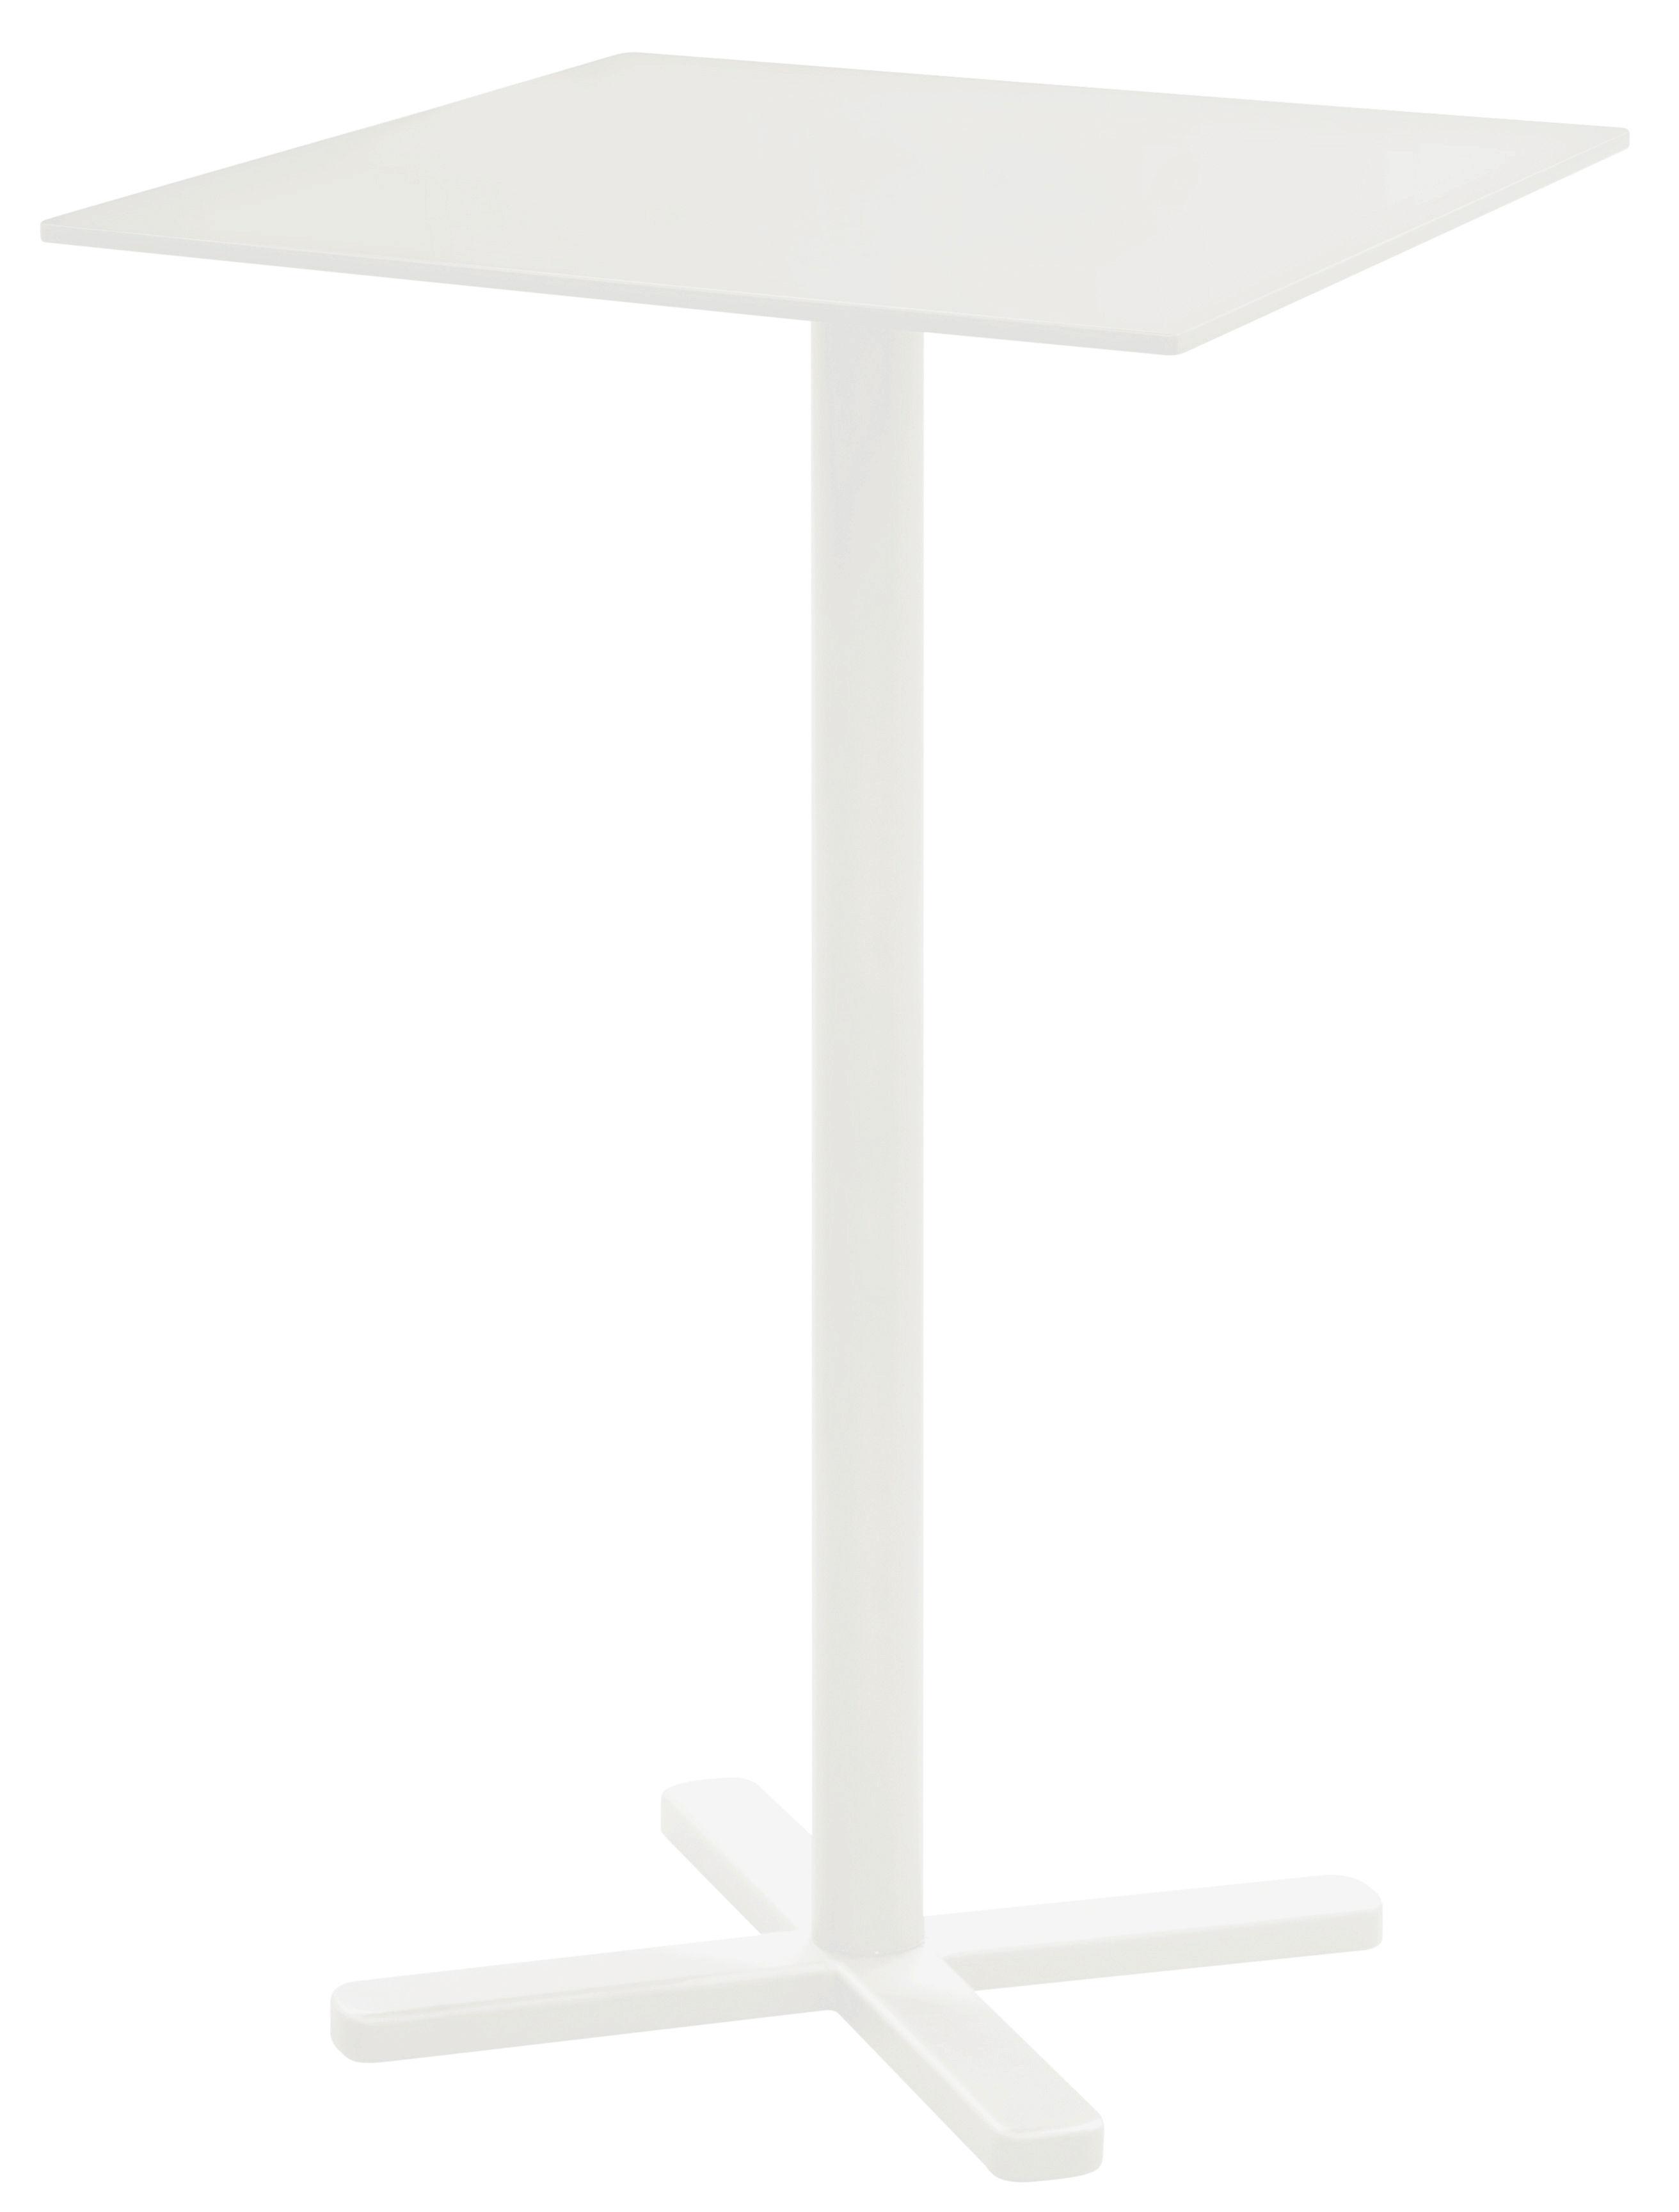 Mobilier - Mange-debout et bars - Mange-debout pliant Darwin / 70 x 70 cm - Emu - Blanc - Acier verni